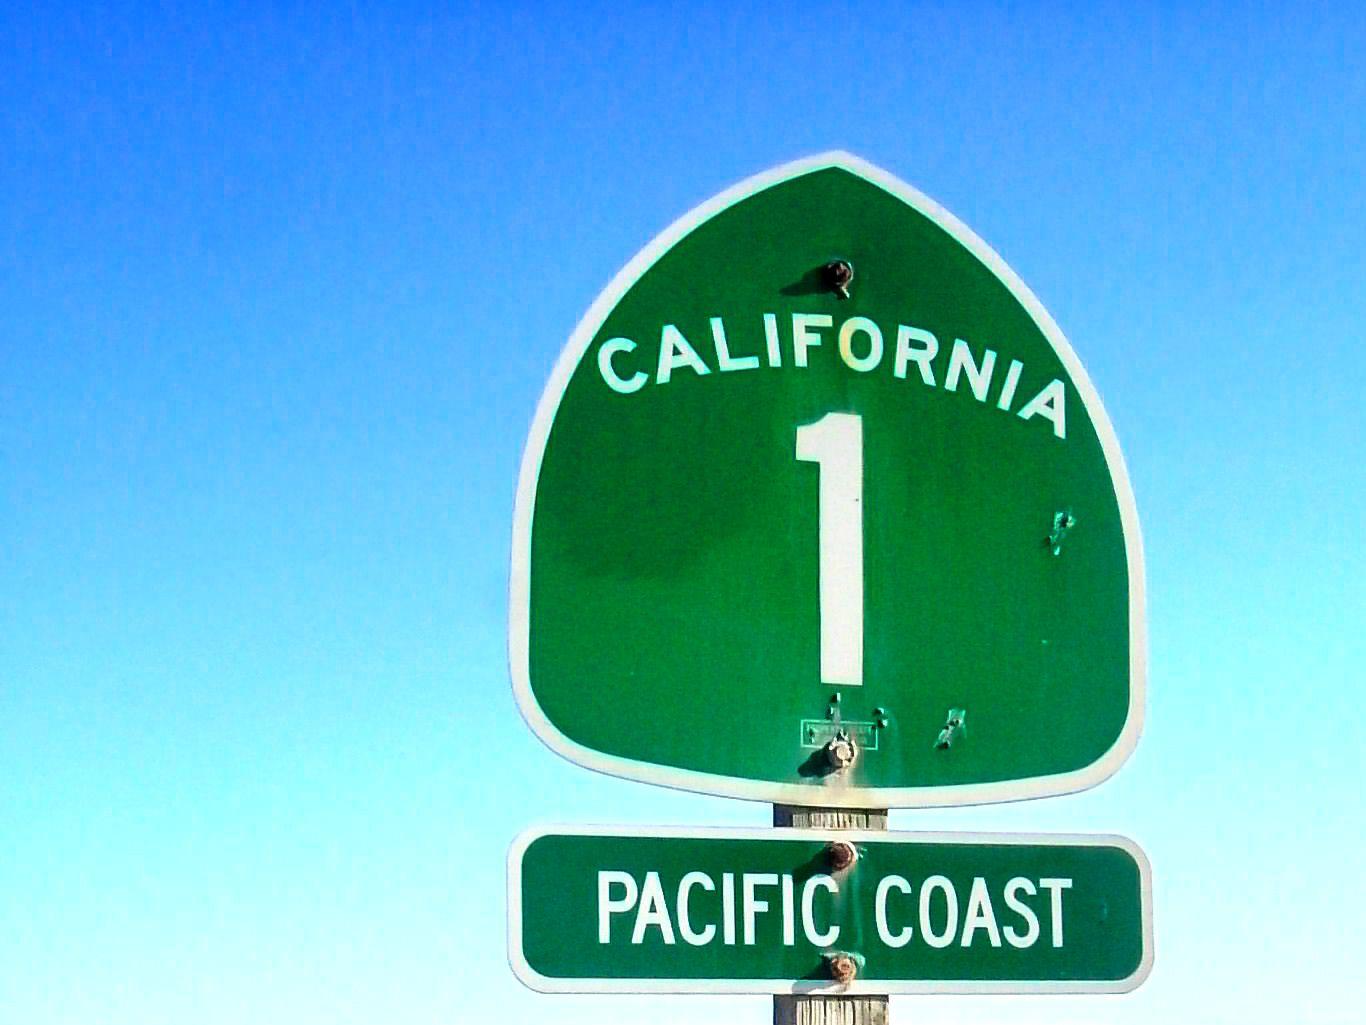 California 1 highway sign